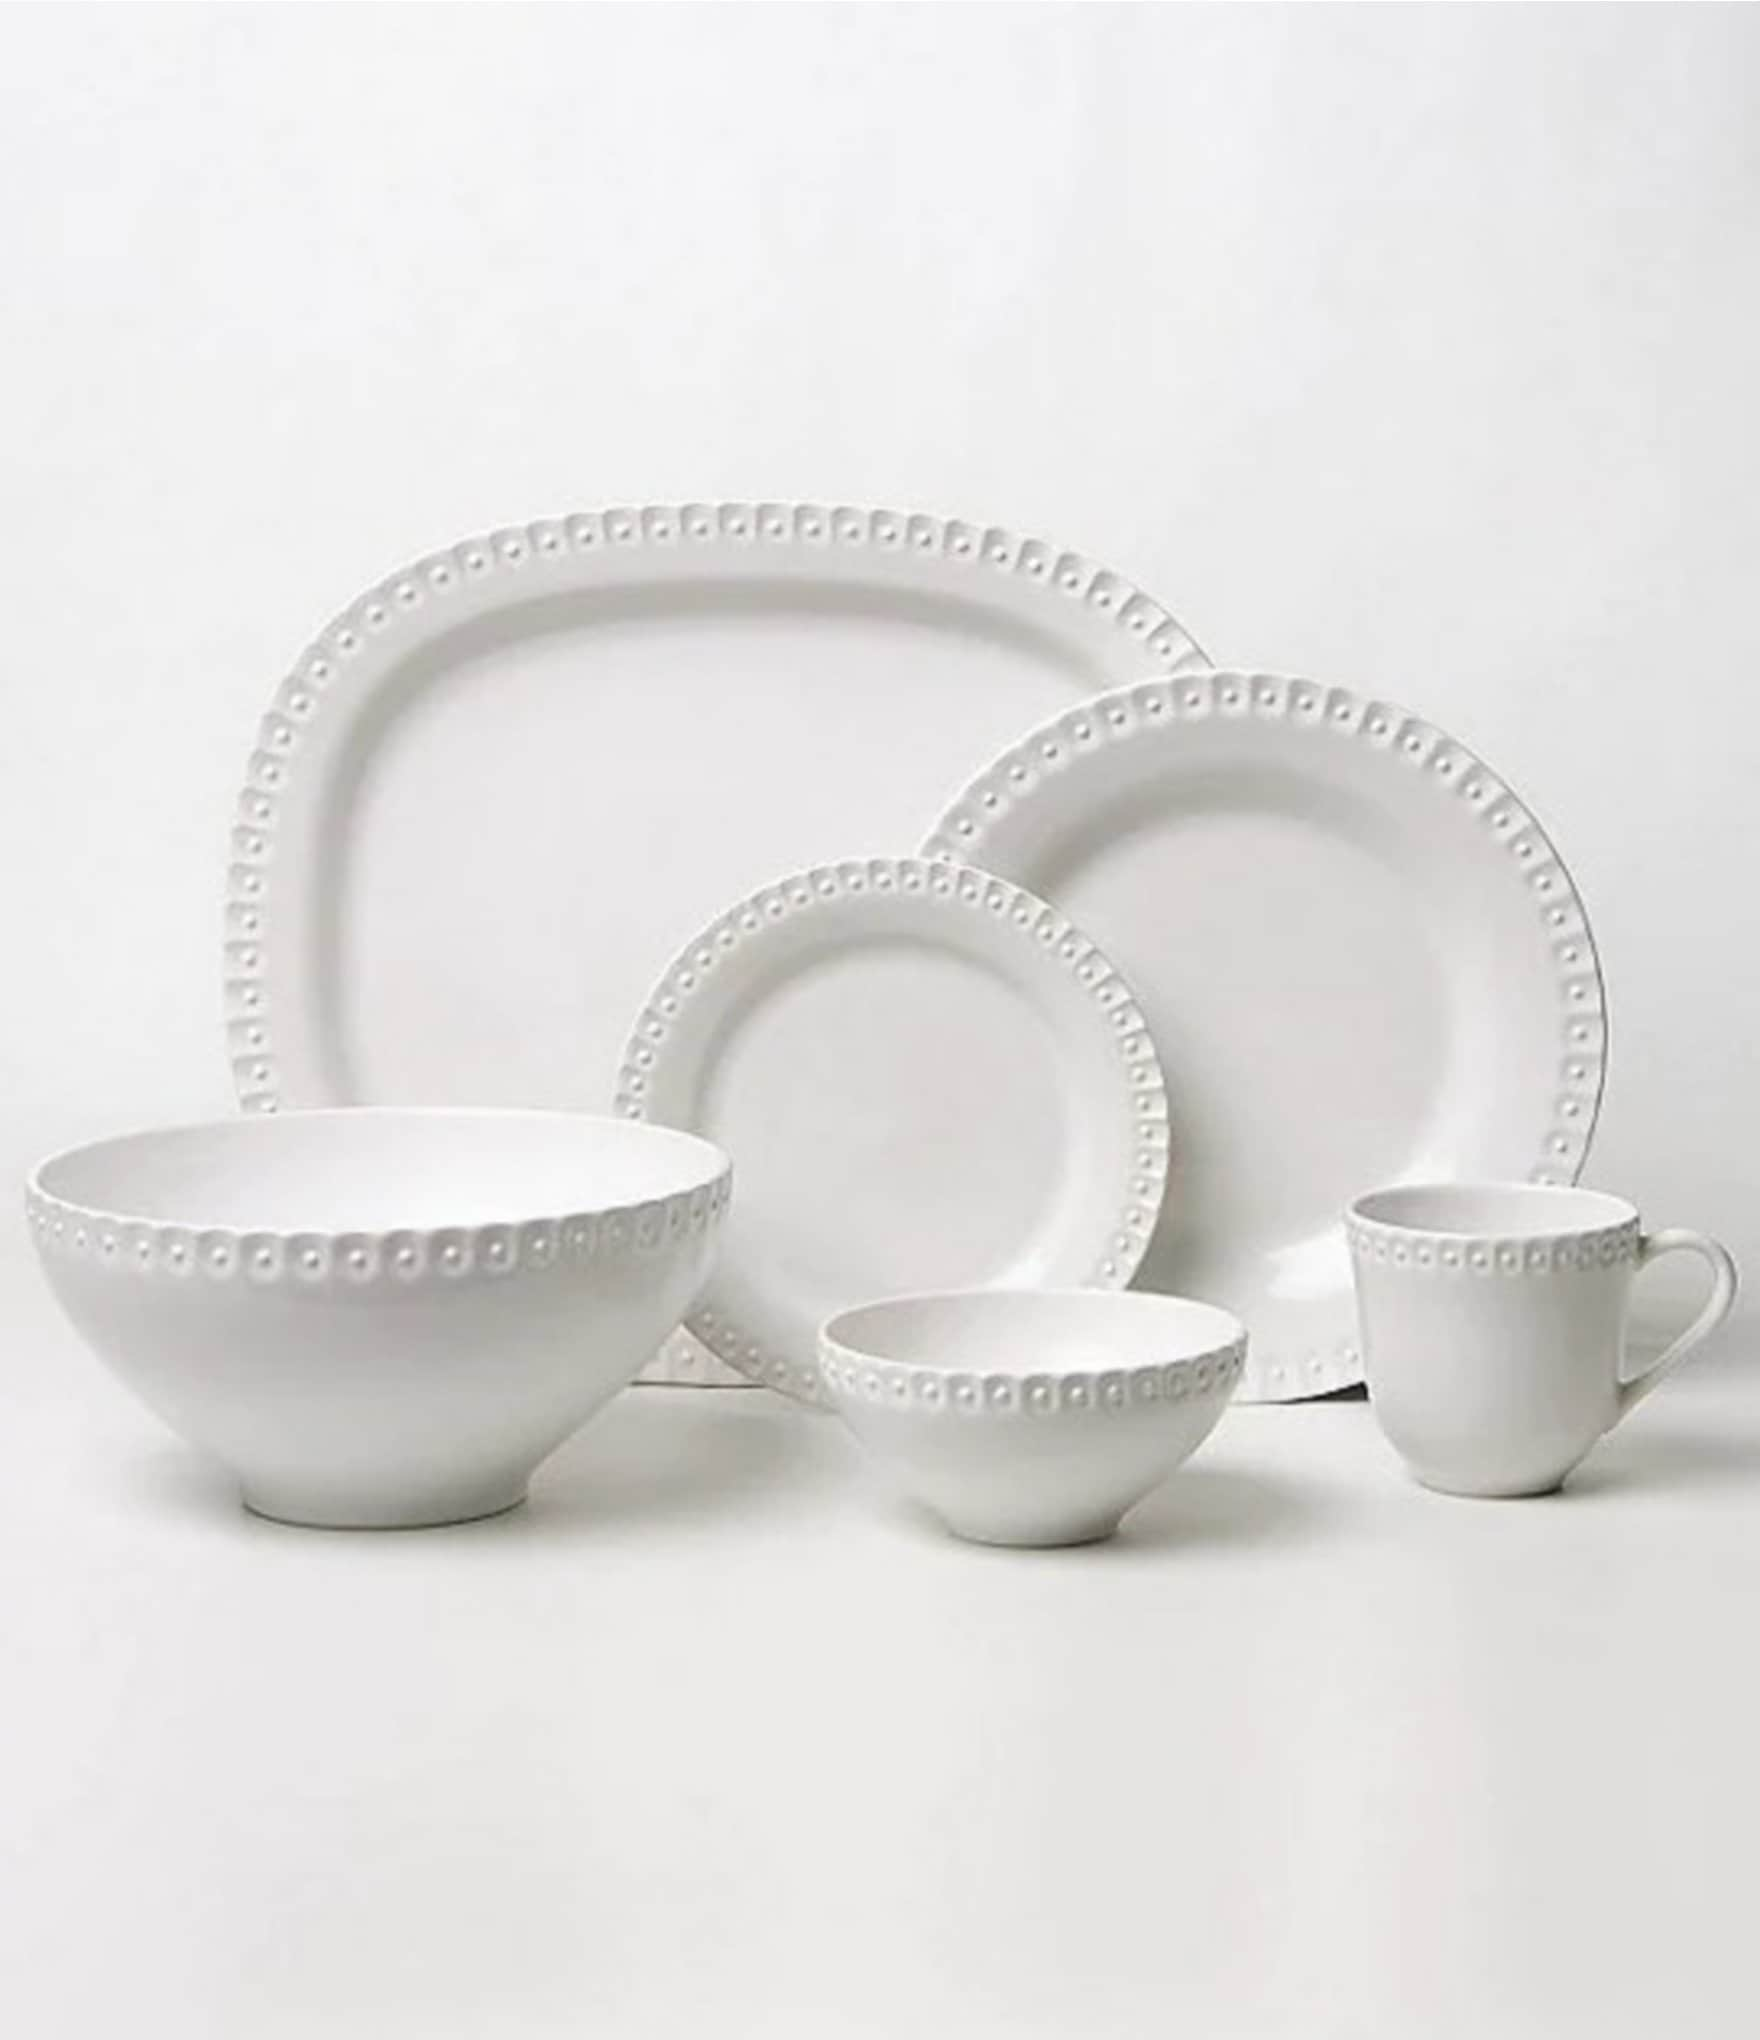 & Casual Everyday Dinnerware: Plates  Dishes \u0026 Sets | Dillards